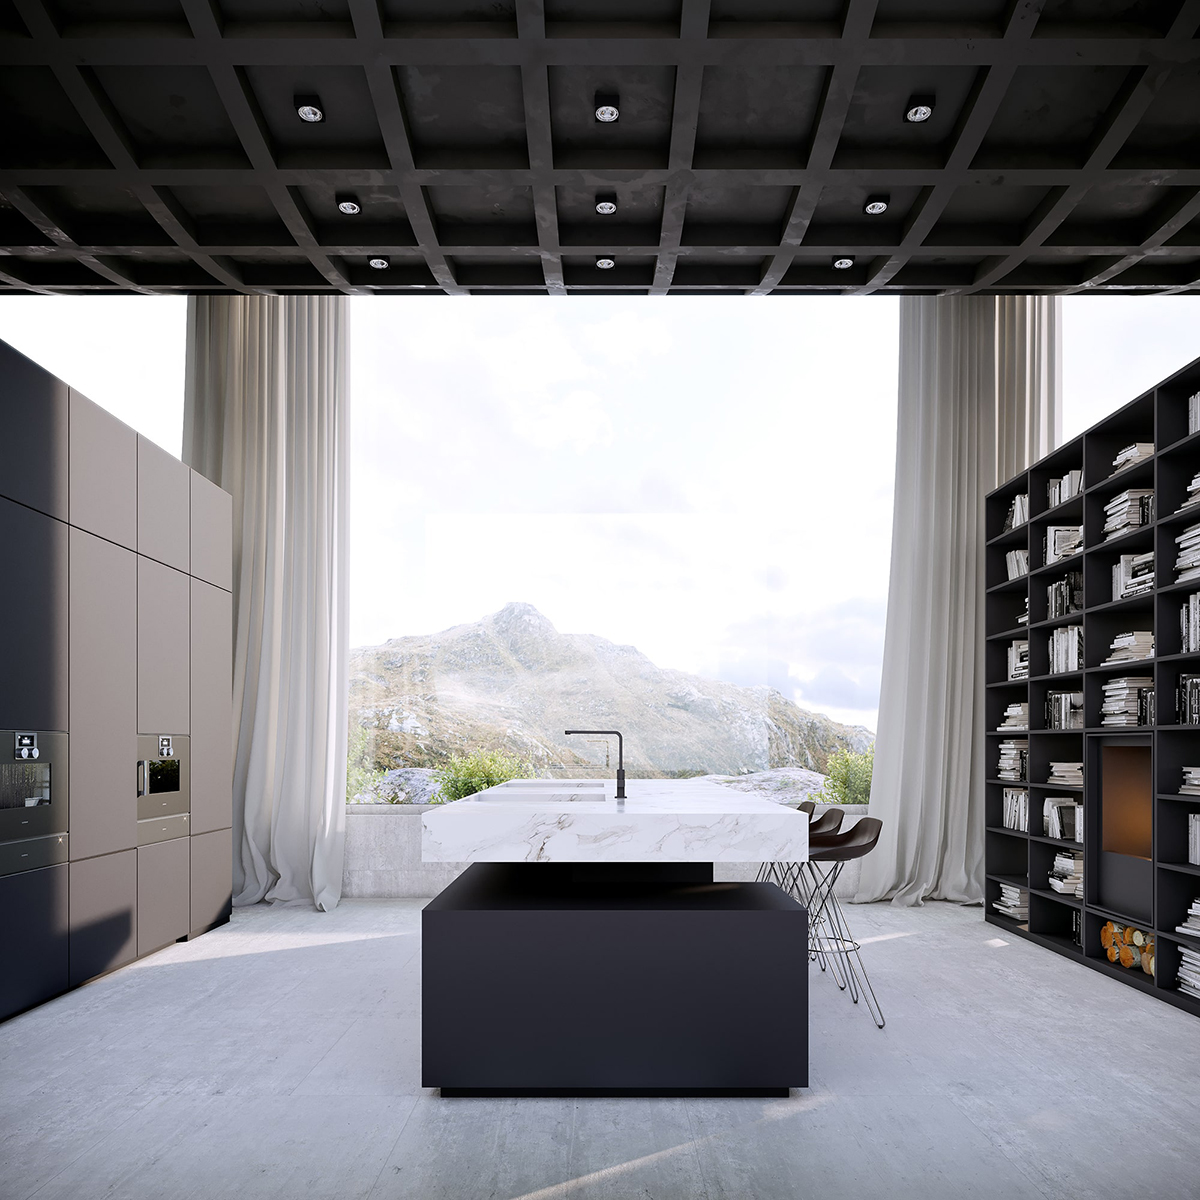 Architect Vladimir Konovalov - Infinity House